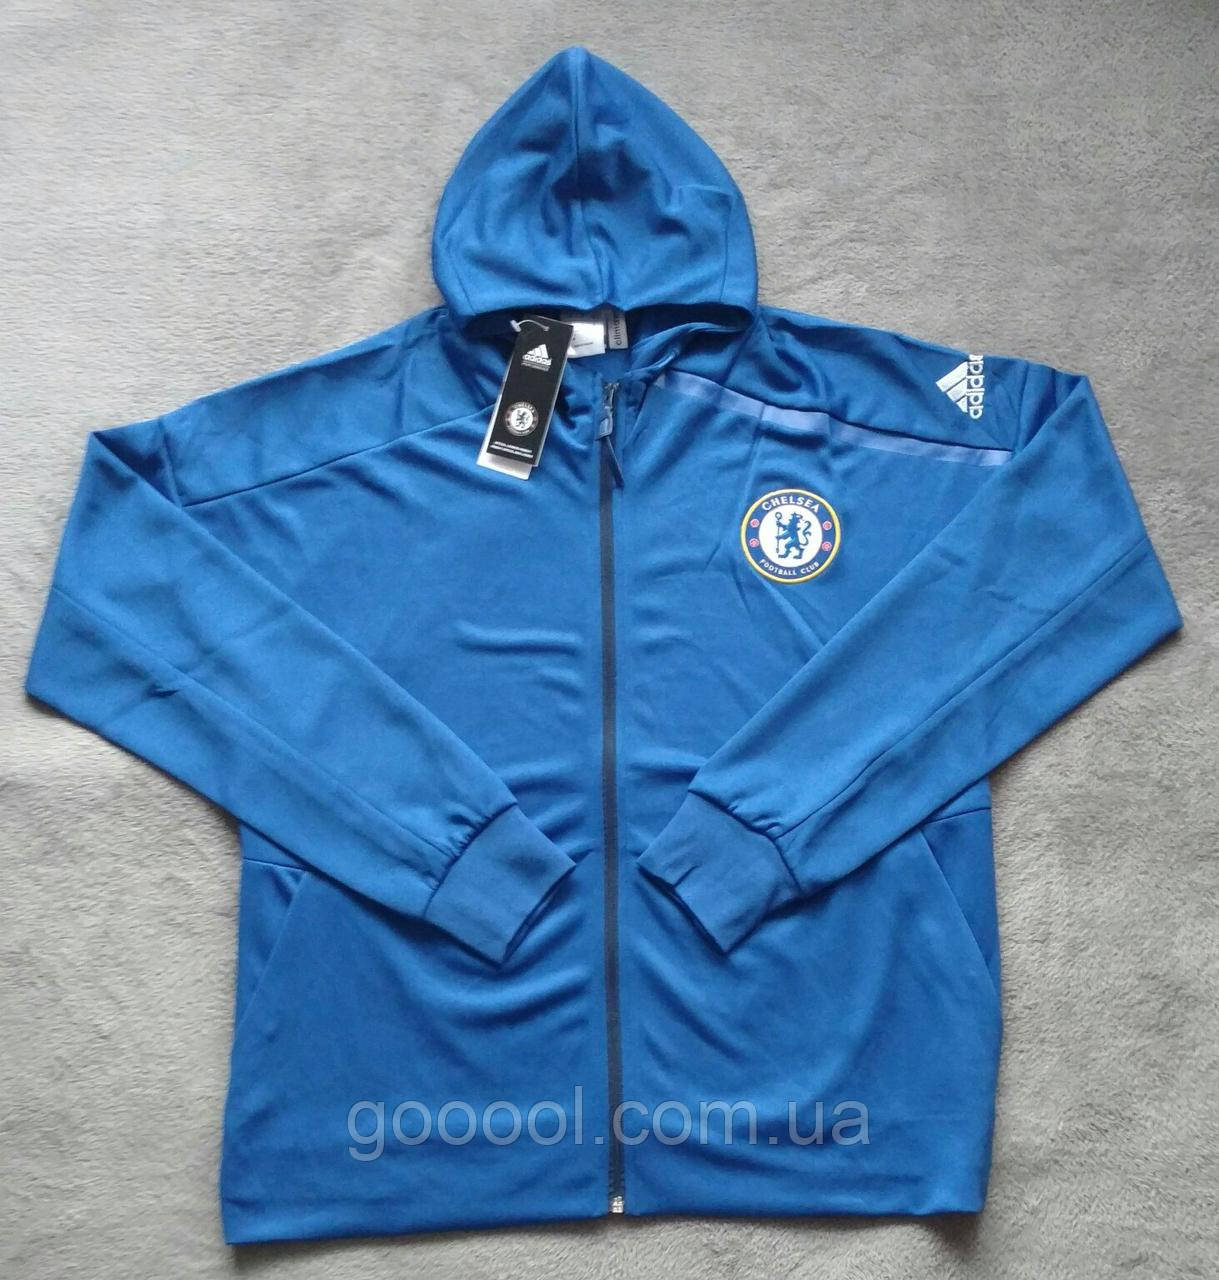 e50679d5cefd Олимпийка мужская с капюшоном Adidas Hoodie Adidas Chelsea F.C. 2016-17 -  ГООООЛ› спортивная